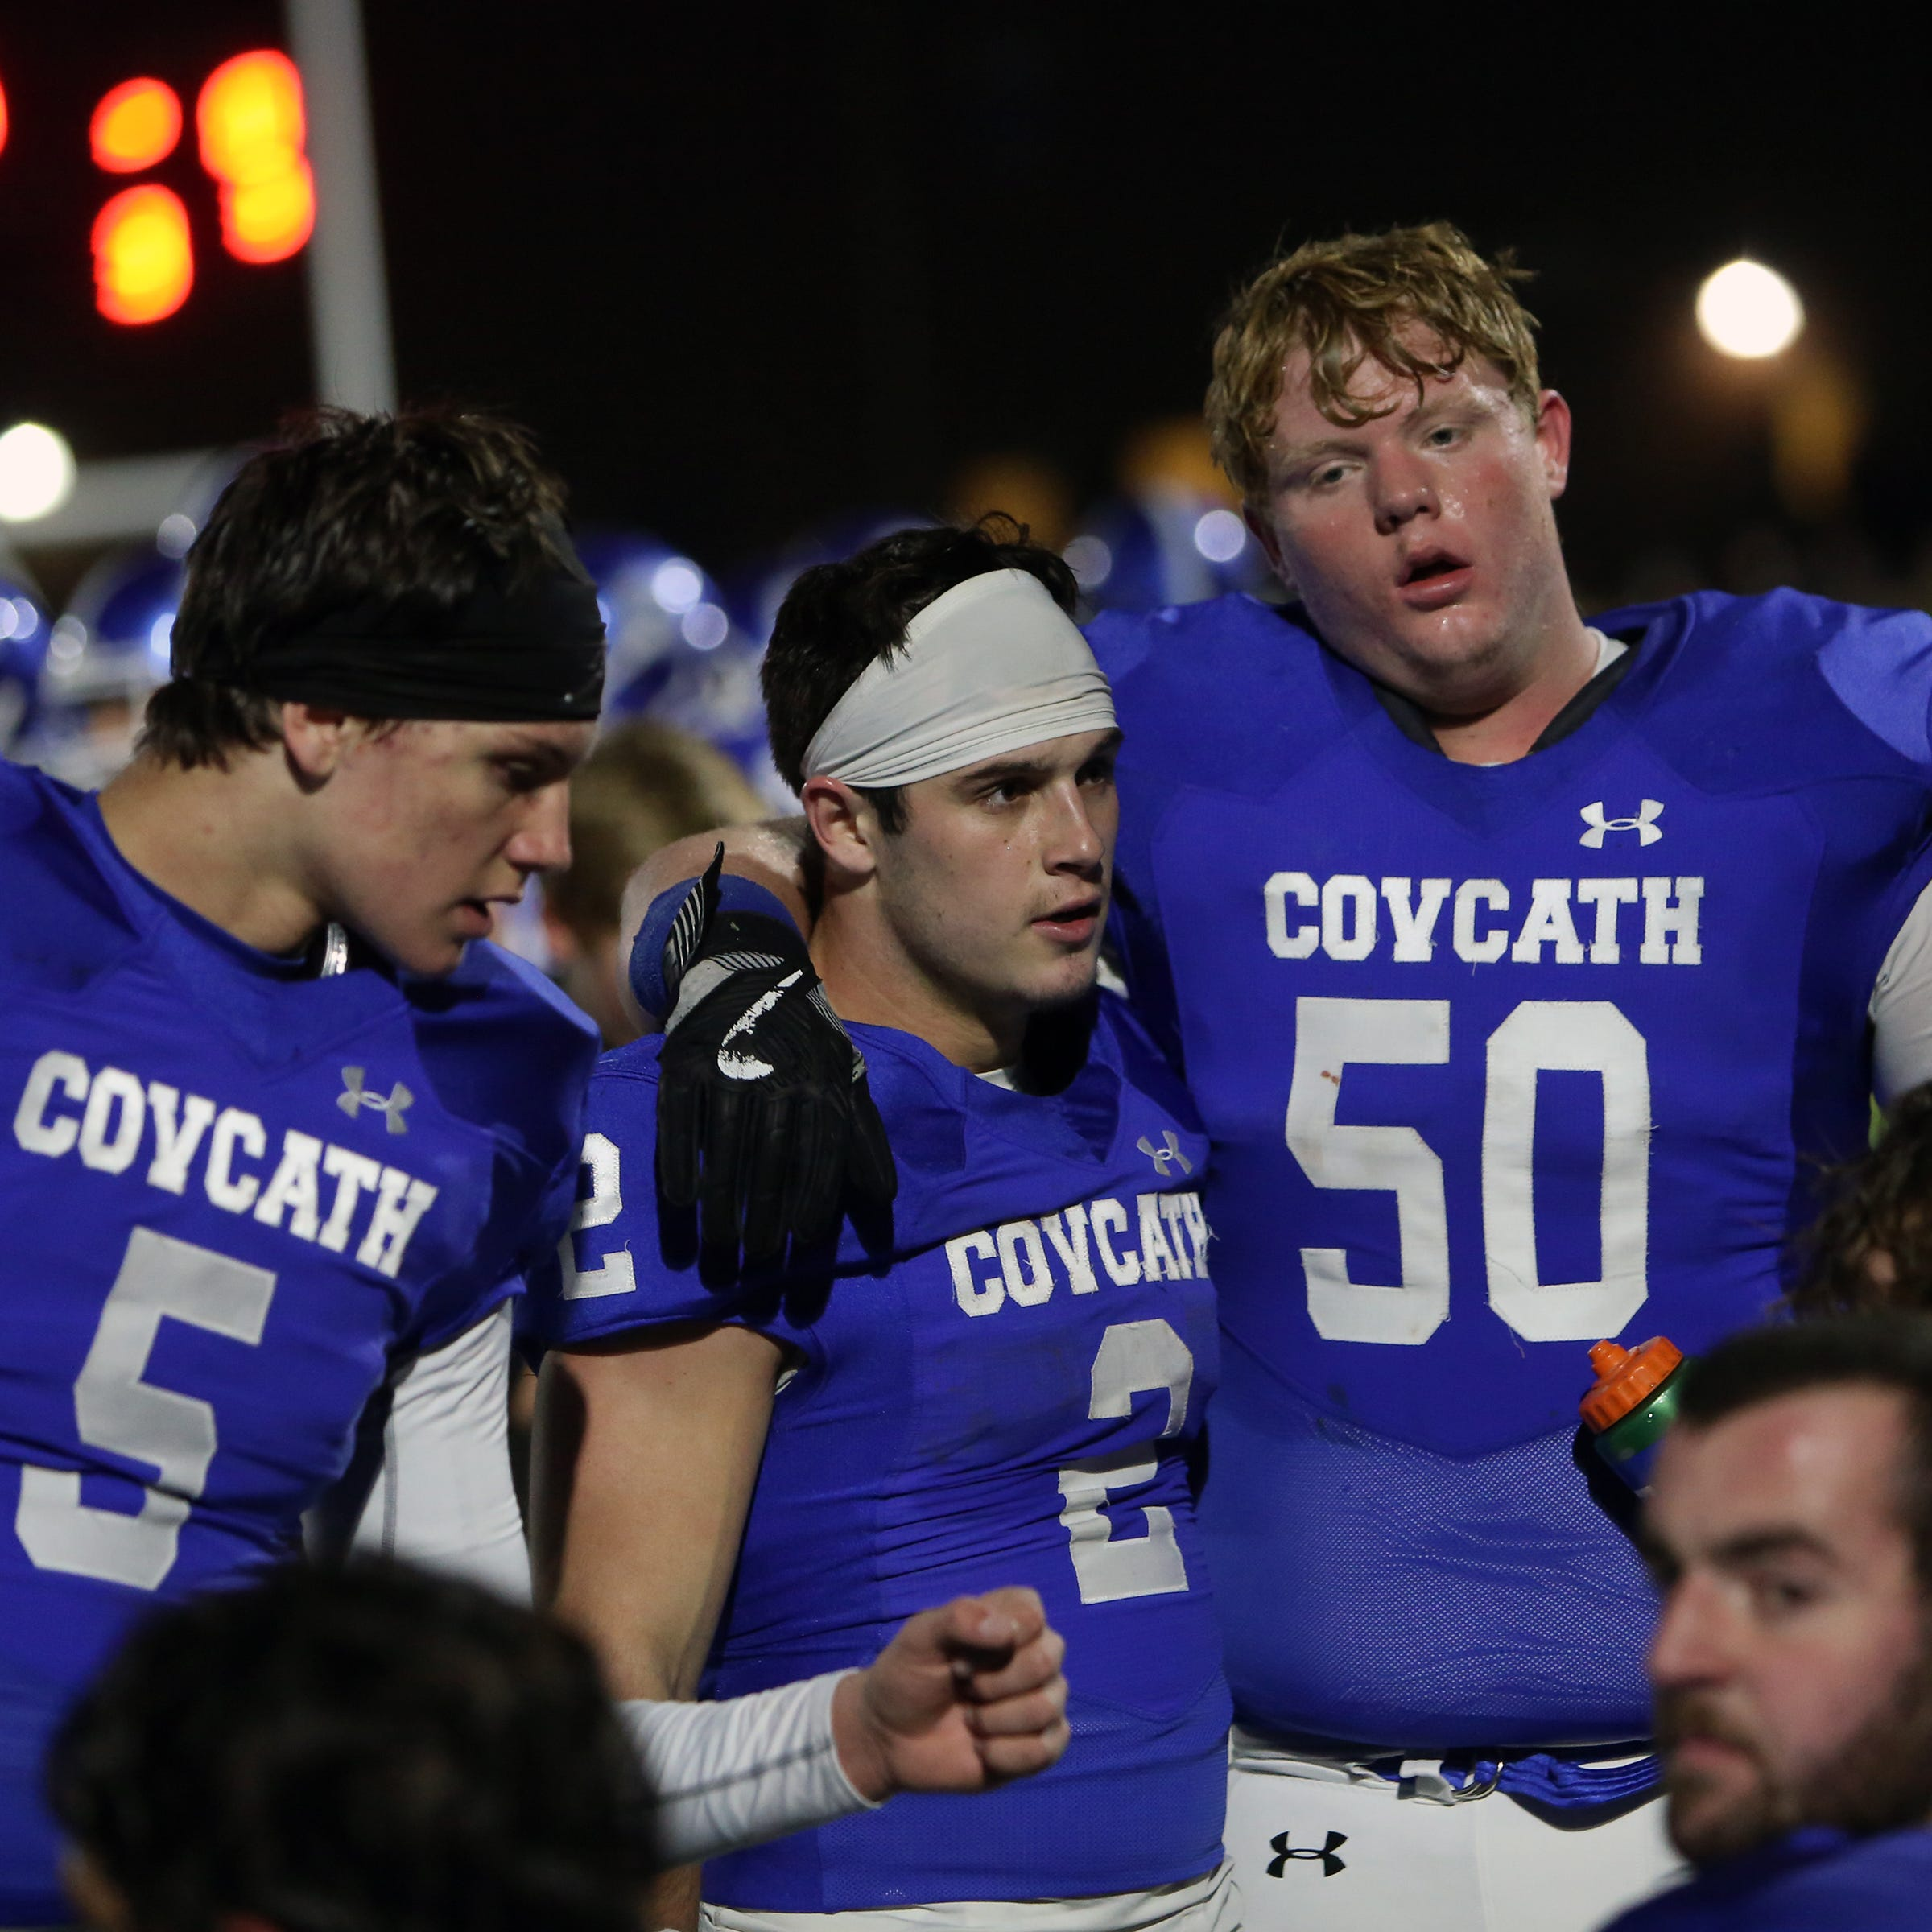 High school football postseason: McGinness, Mayer shut down Highlands in 36-0 CovCath win